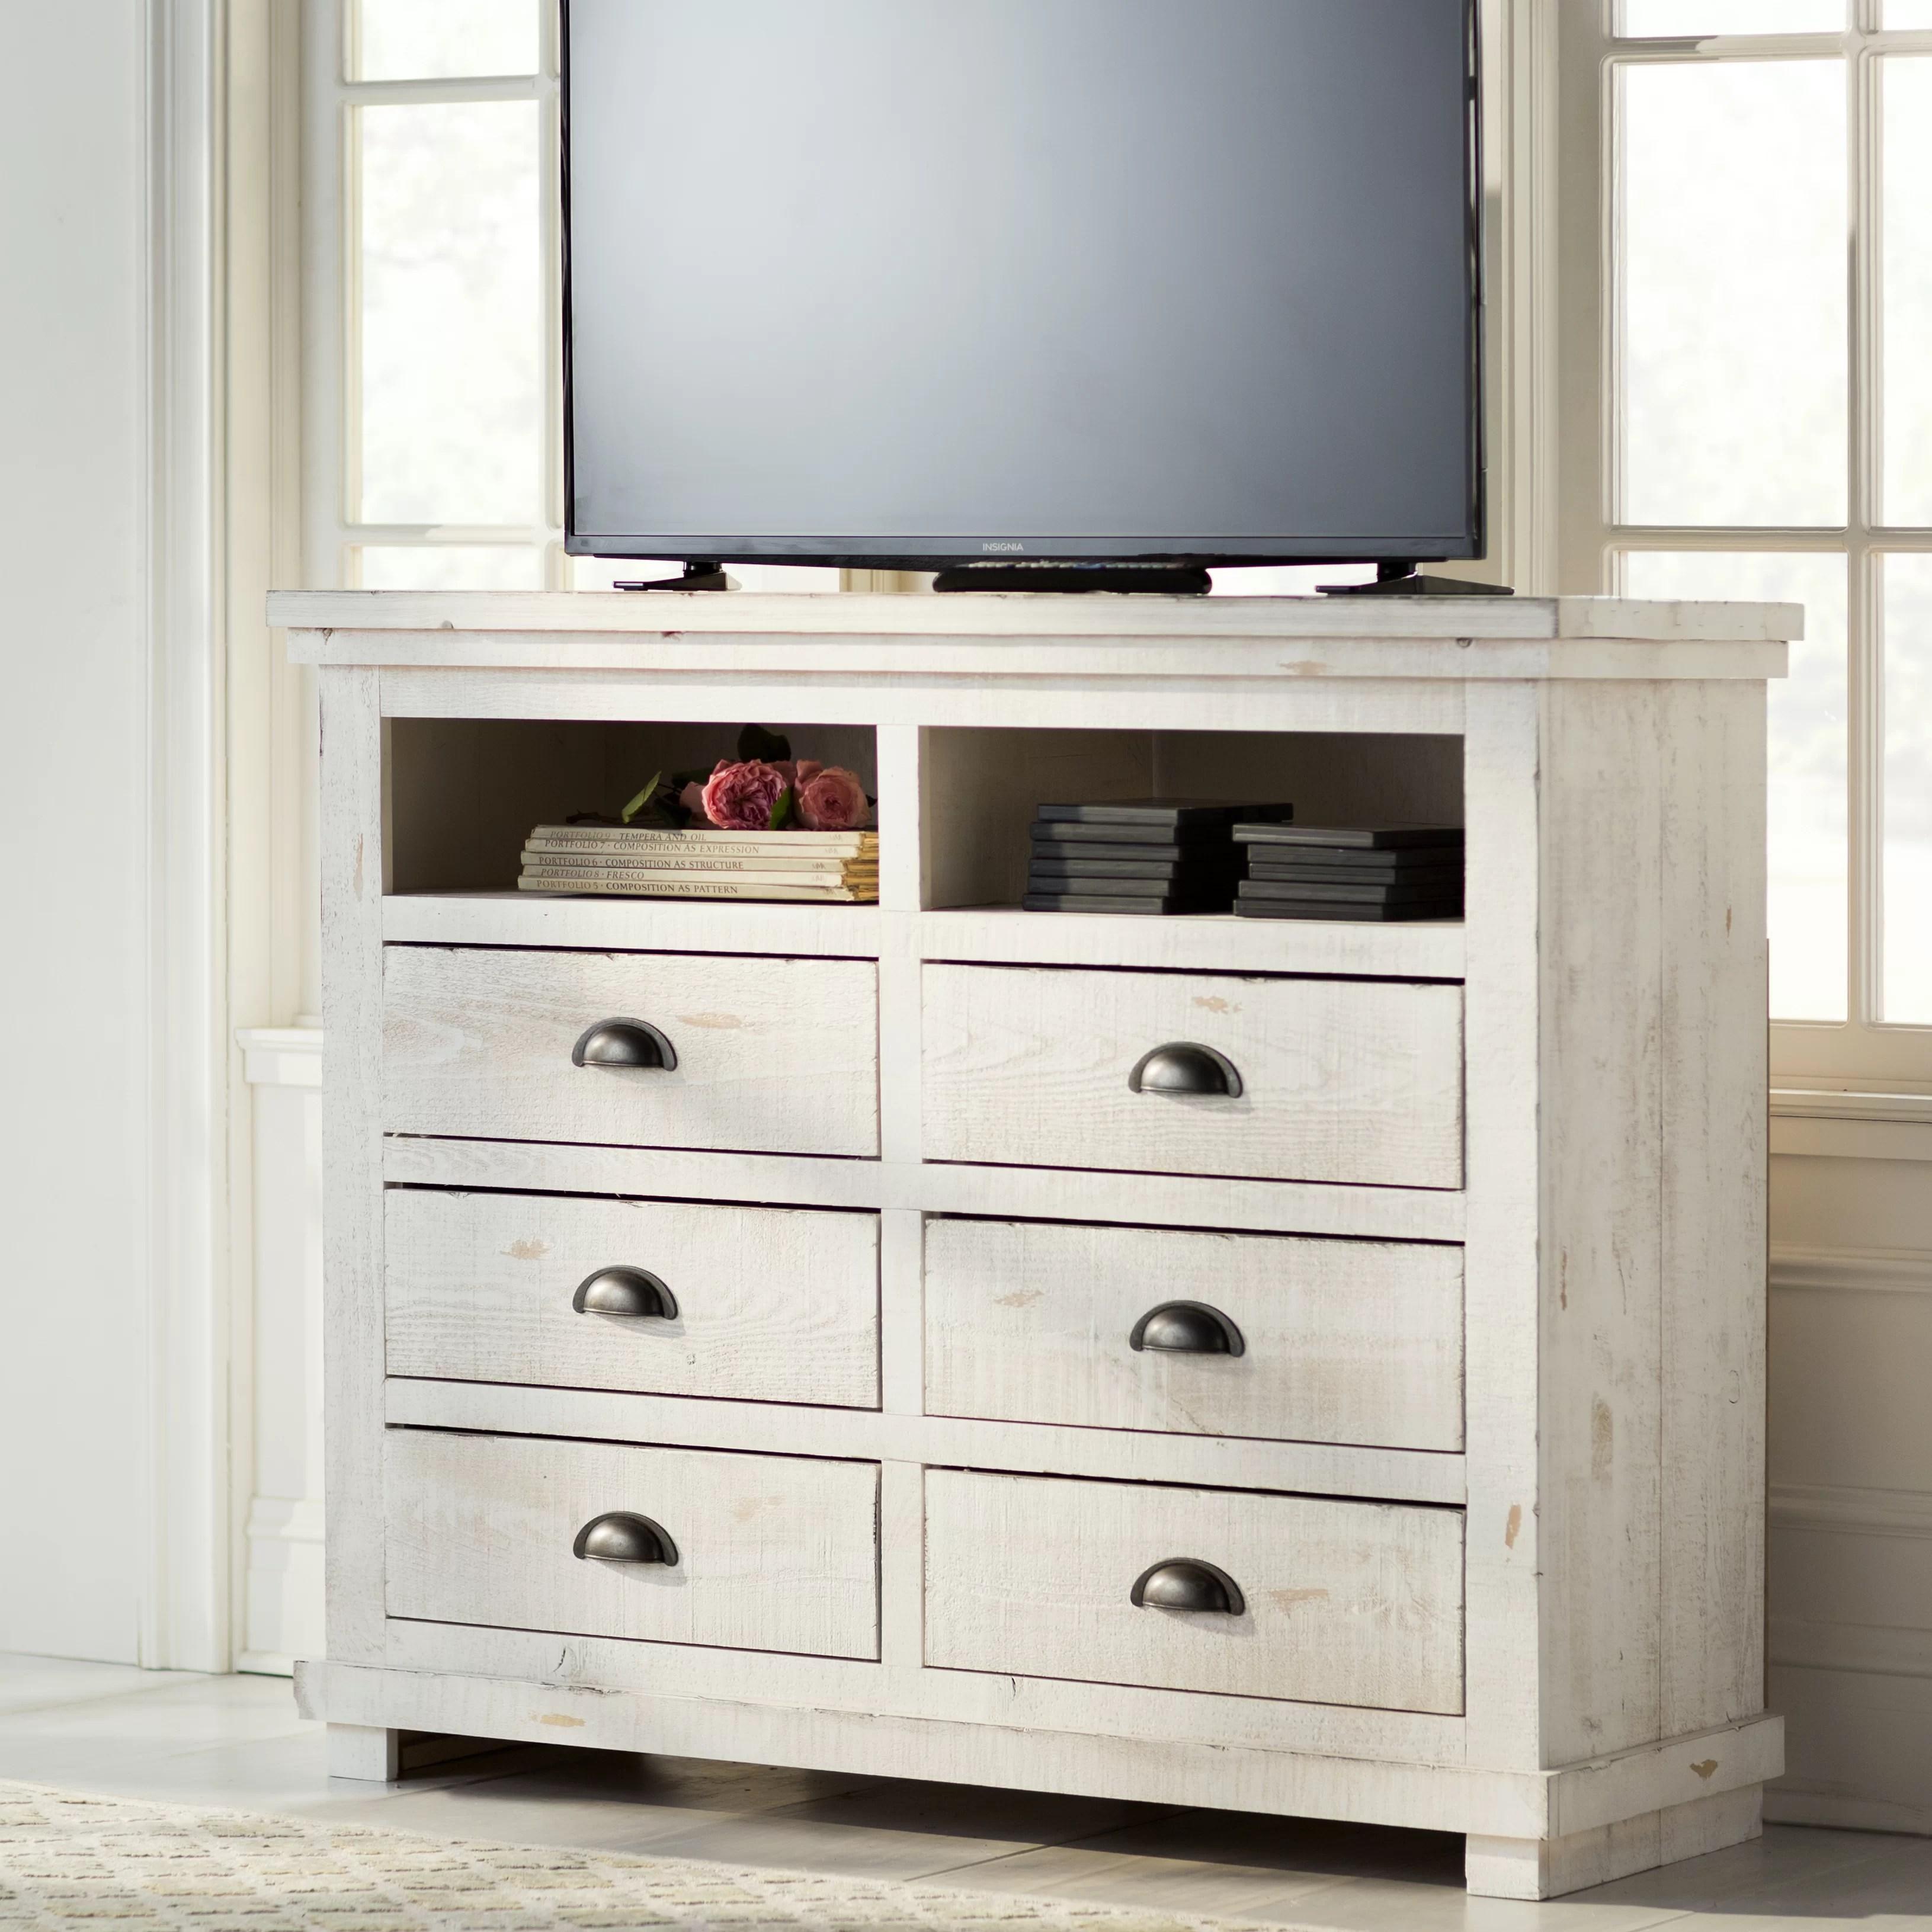 media chest for living room duck egg blue with brown sofa lark manor castagnier 6 drawer reviews wayfair